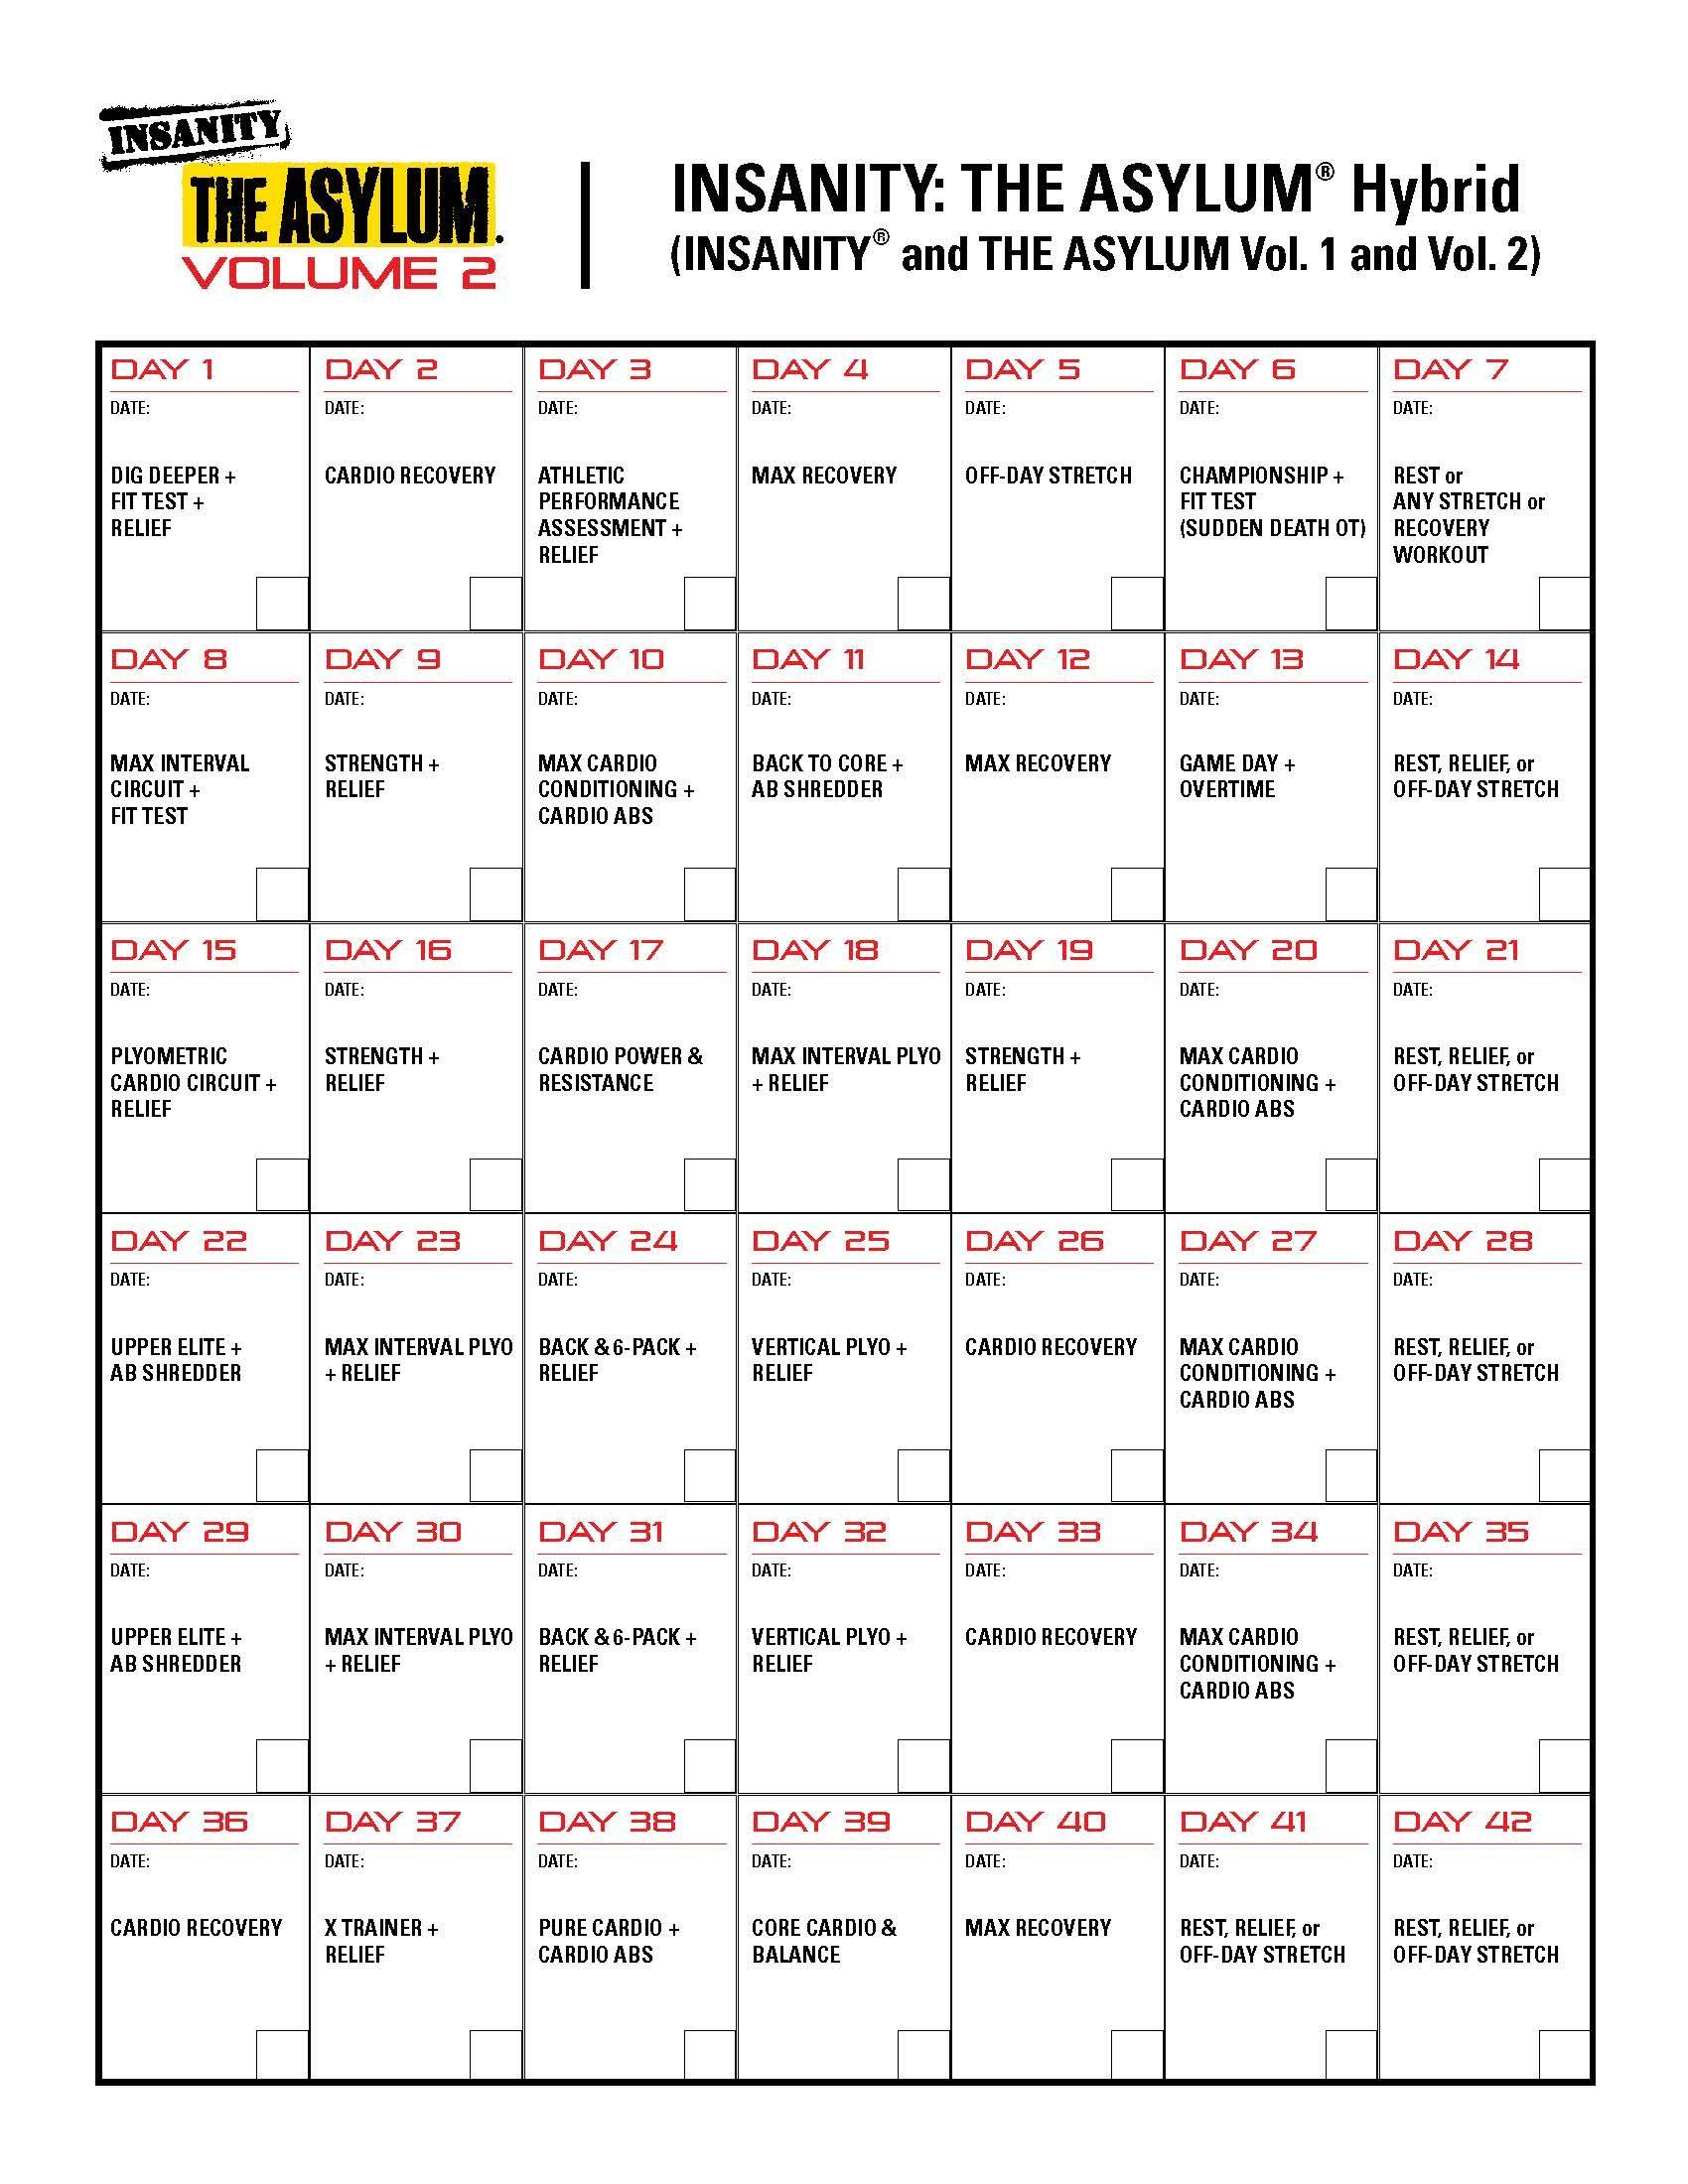 Insanity Asylum Volume 1 Calendar : insanity, asylum, volume, calendar, Insanity/Asylum, Hybrid, Month, Beachbody, Workouts,, Workout, Calendar,, Insanity, Asylum